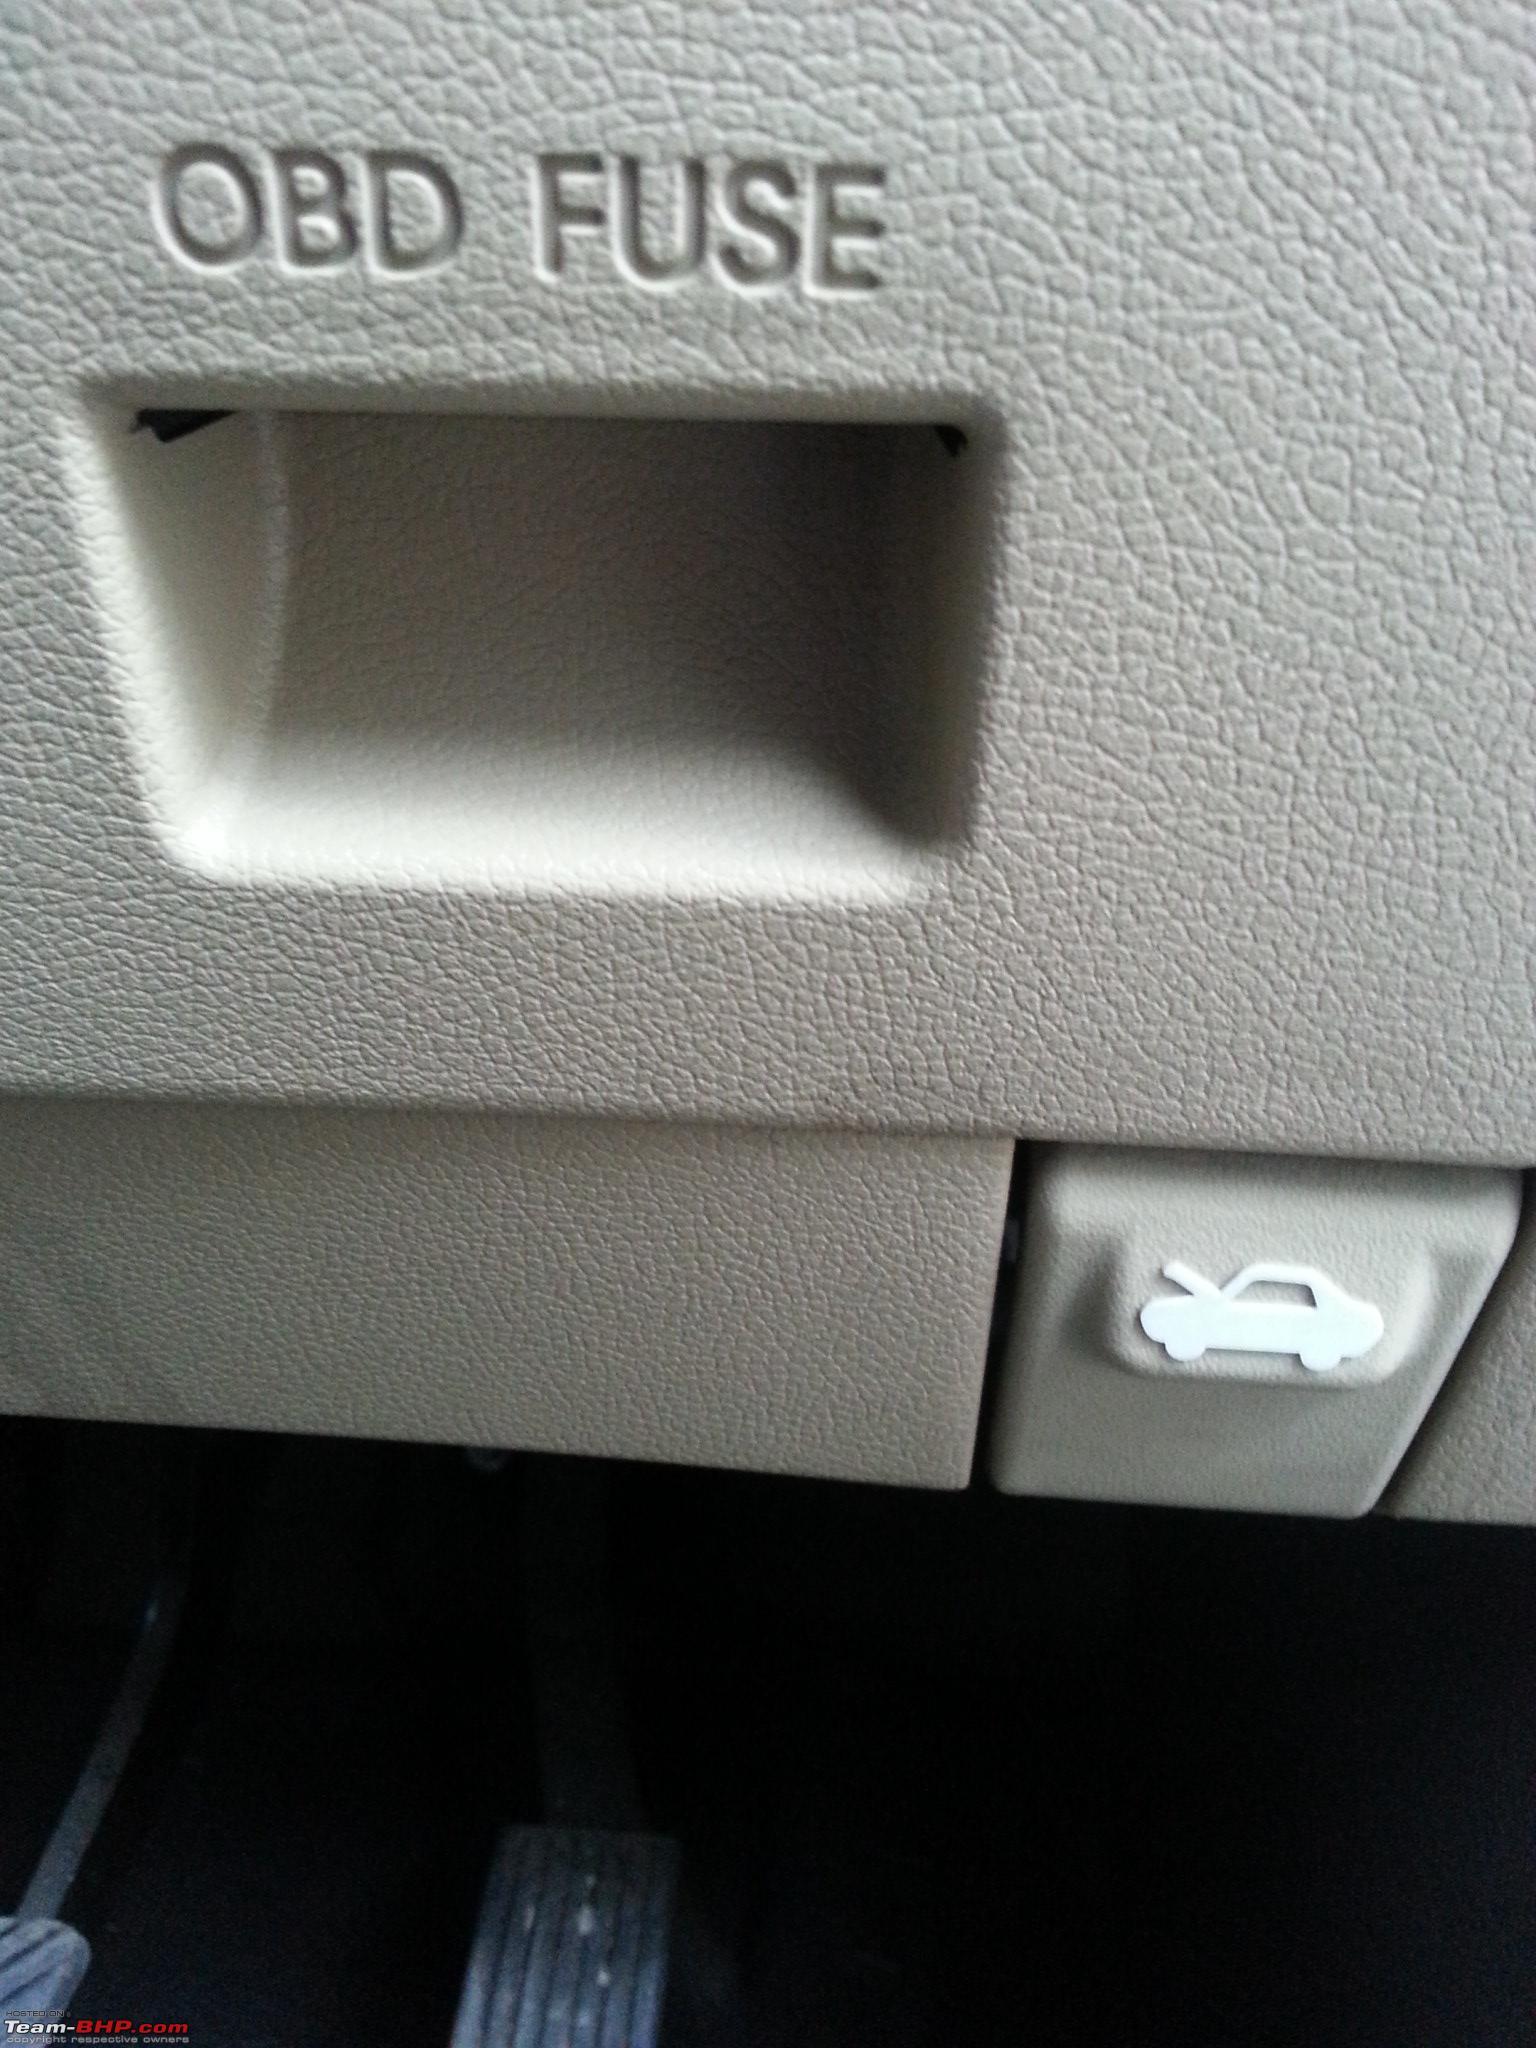 Hyundai Verna Fuse Box Simple Wiring Diagram 2012 Accent Fluidic Sx 1 6l Diesel The Street Hawk 2009 Sonata